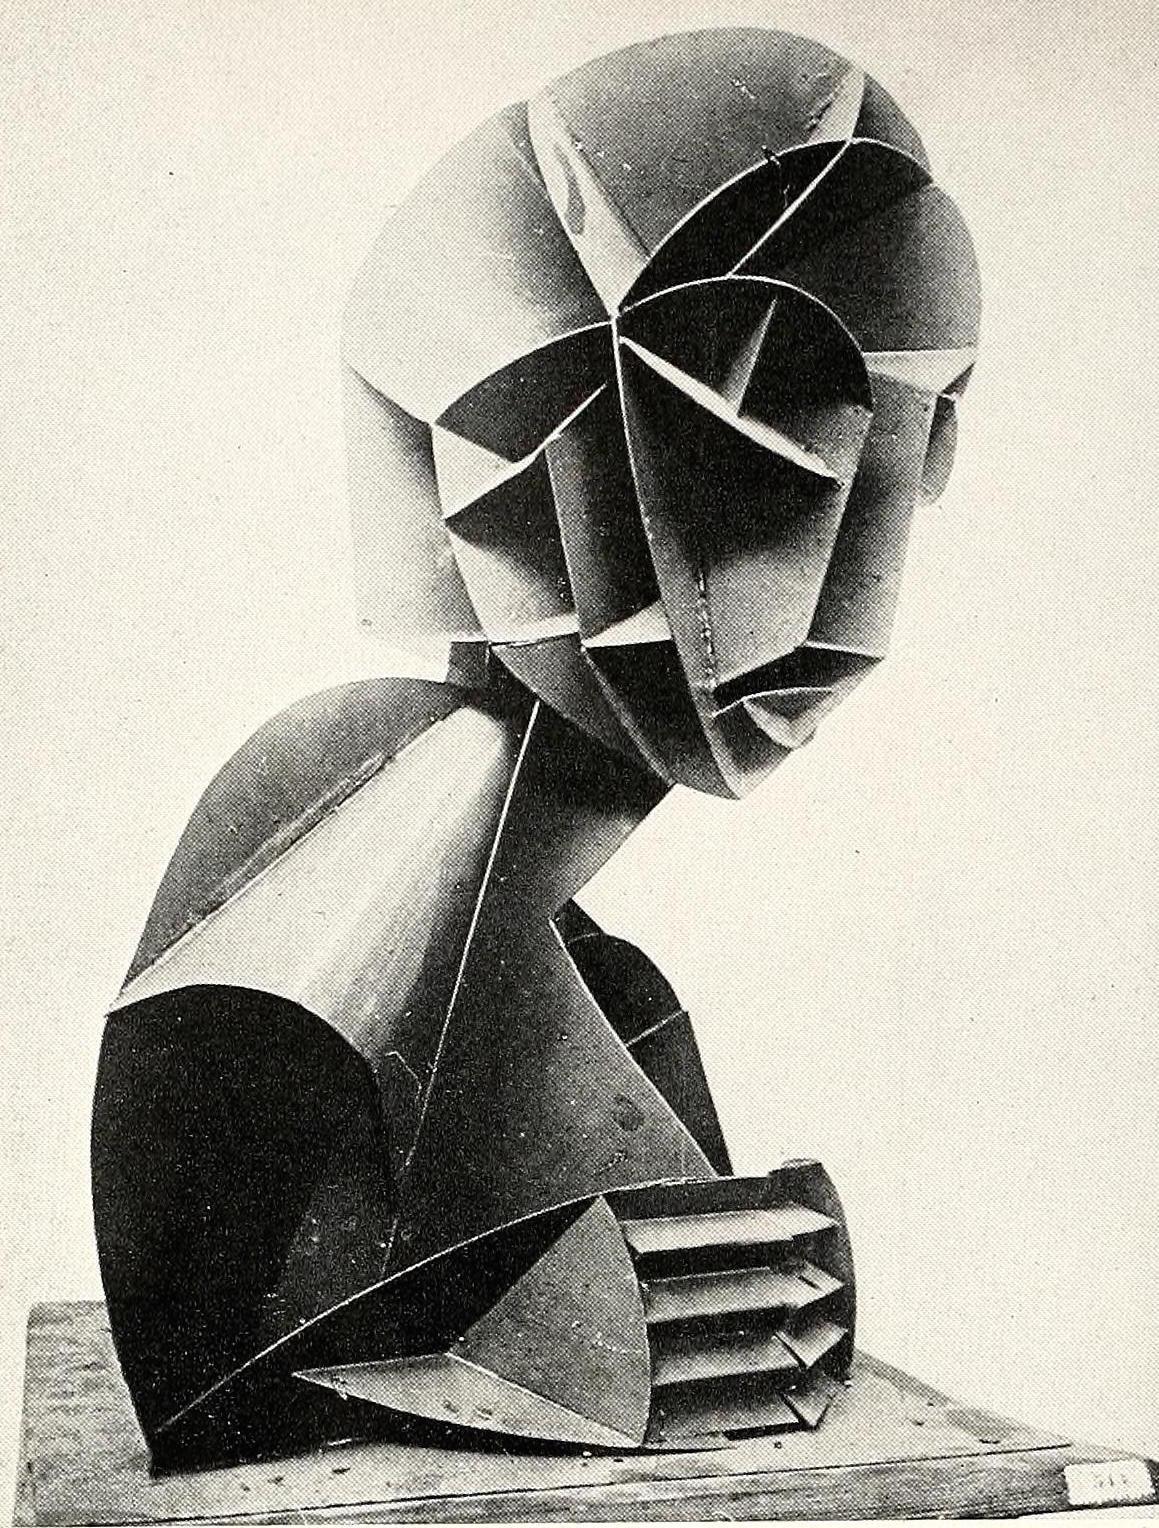 Naum Gabo, bust (1916), plastic